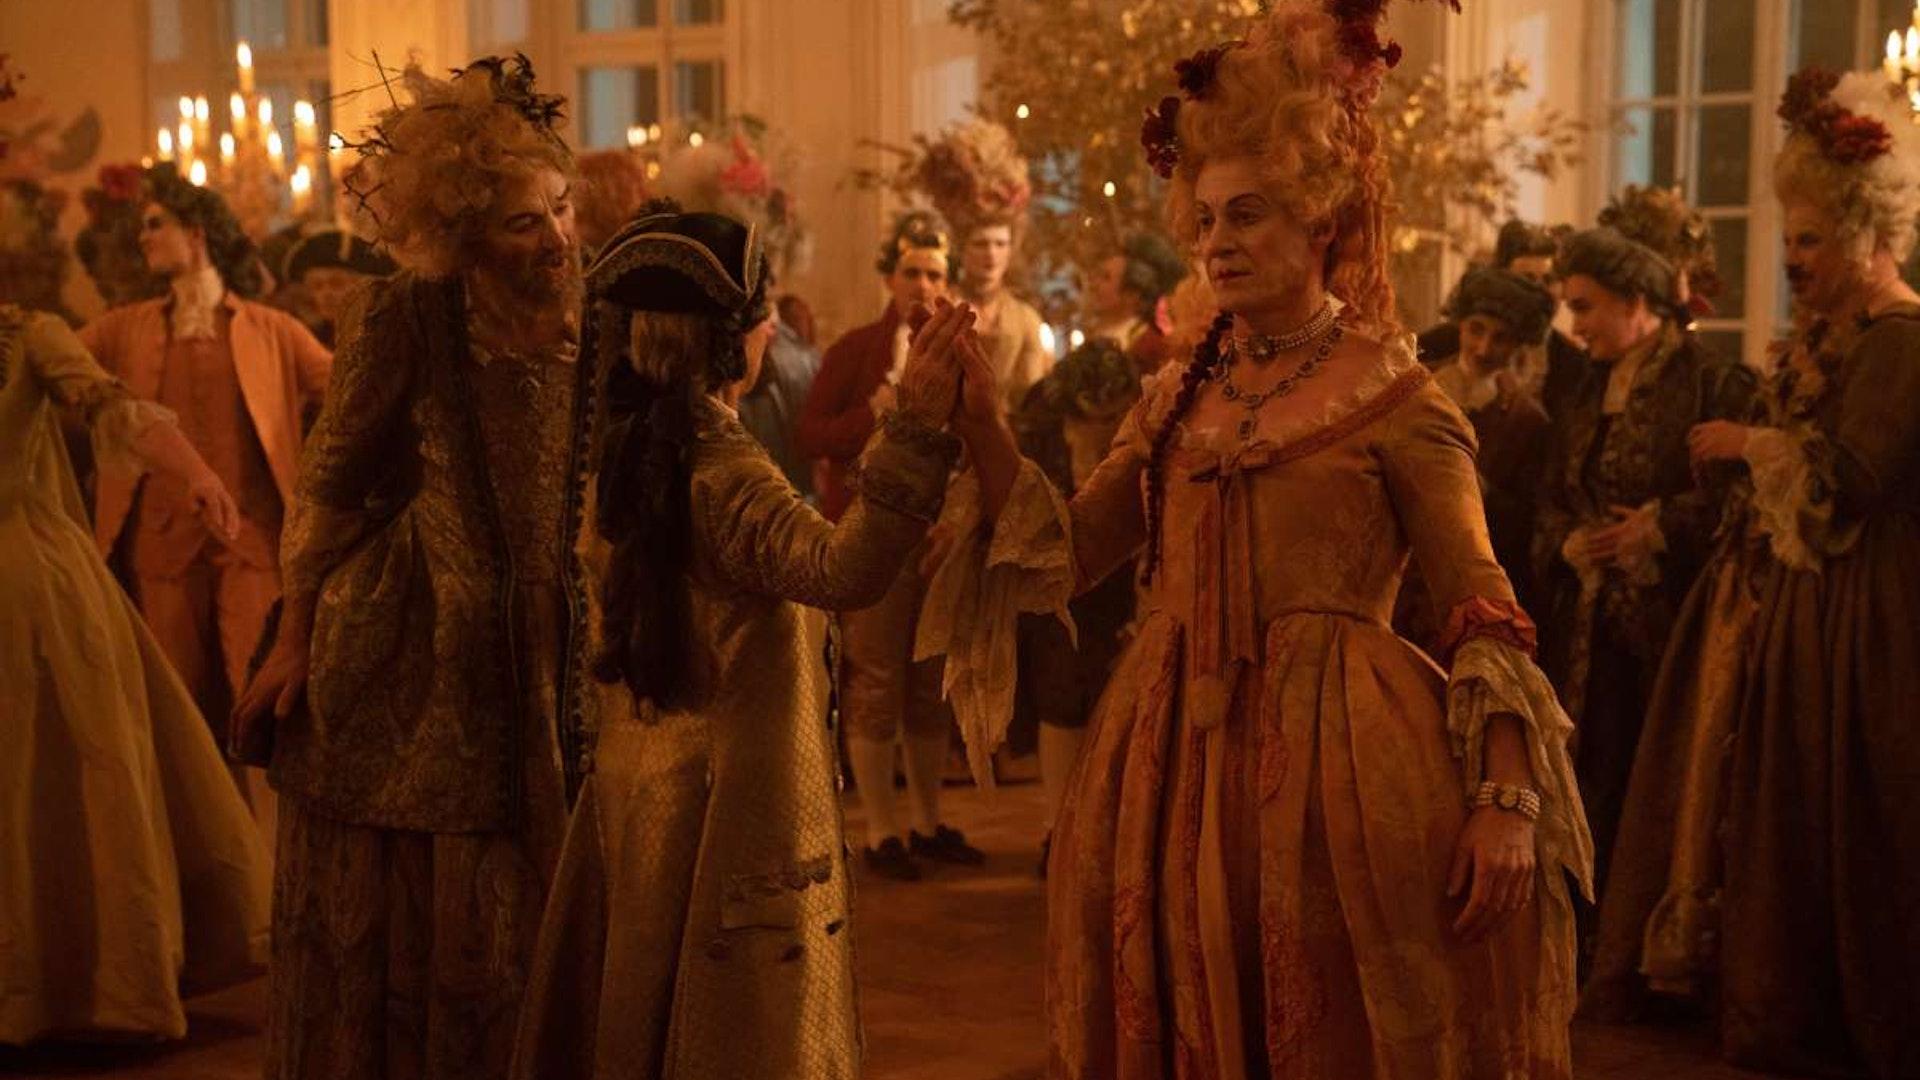 hbo-catherine-the-great-ball-helen-mirren-suit-orlov-richard-roxburgh-dress